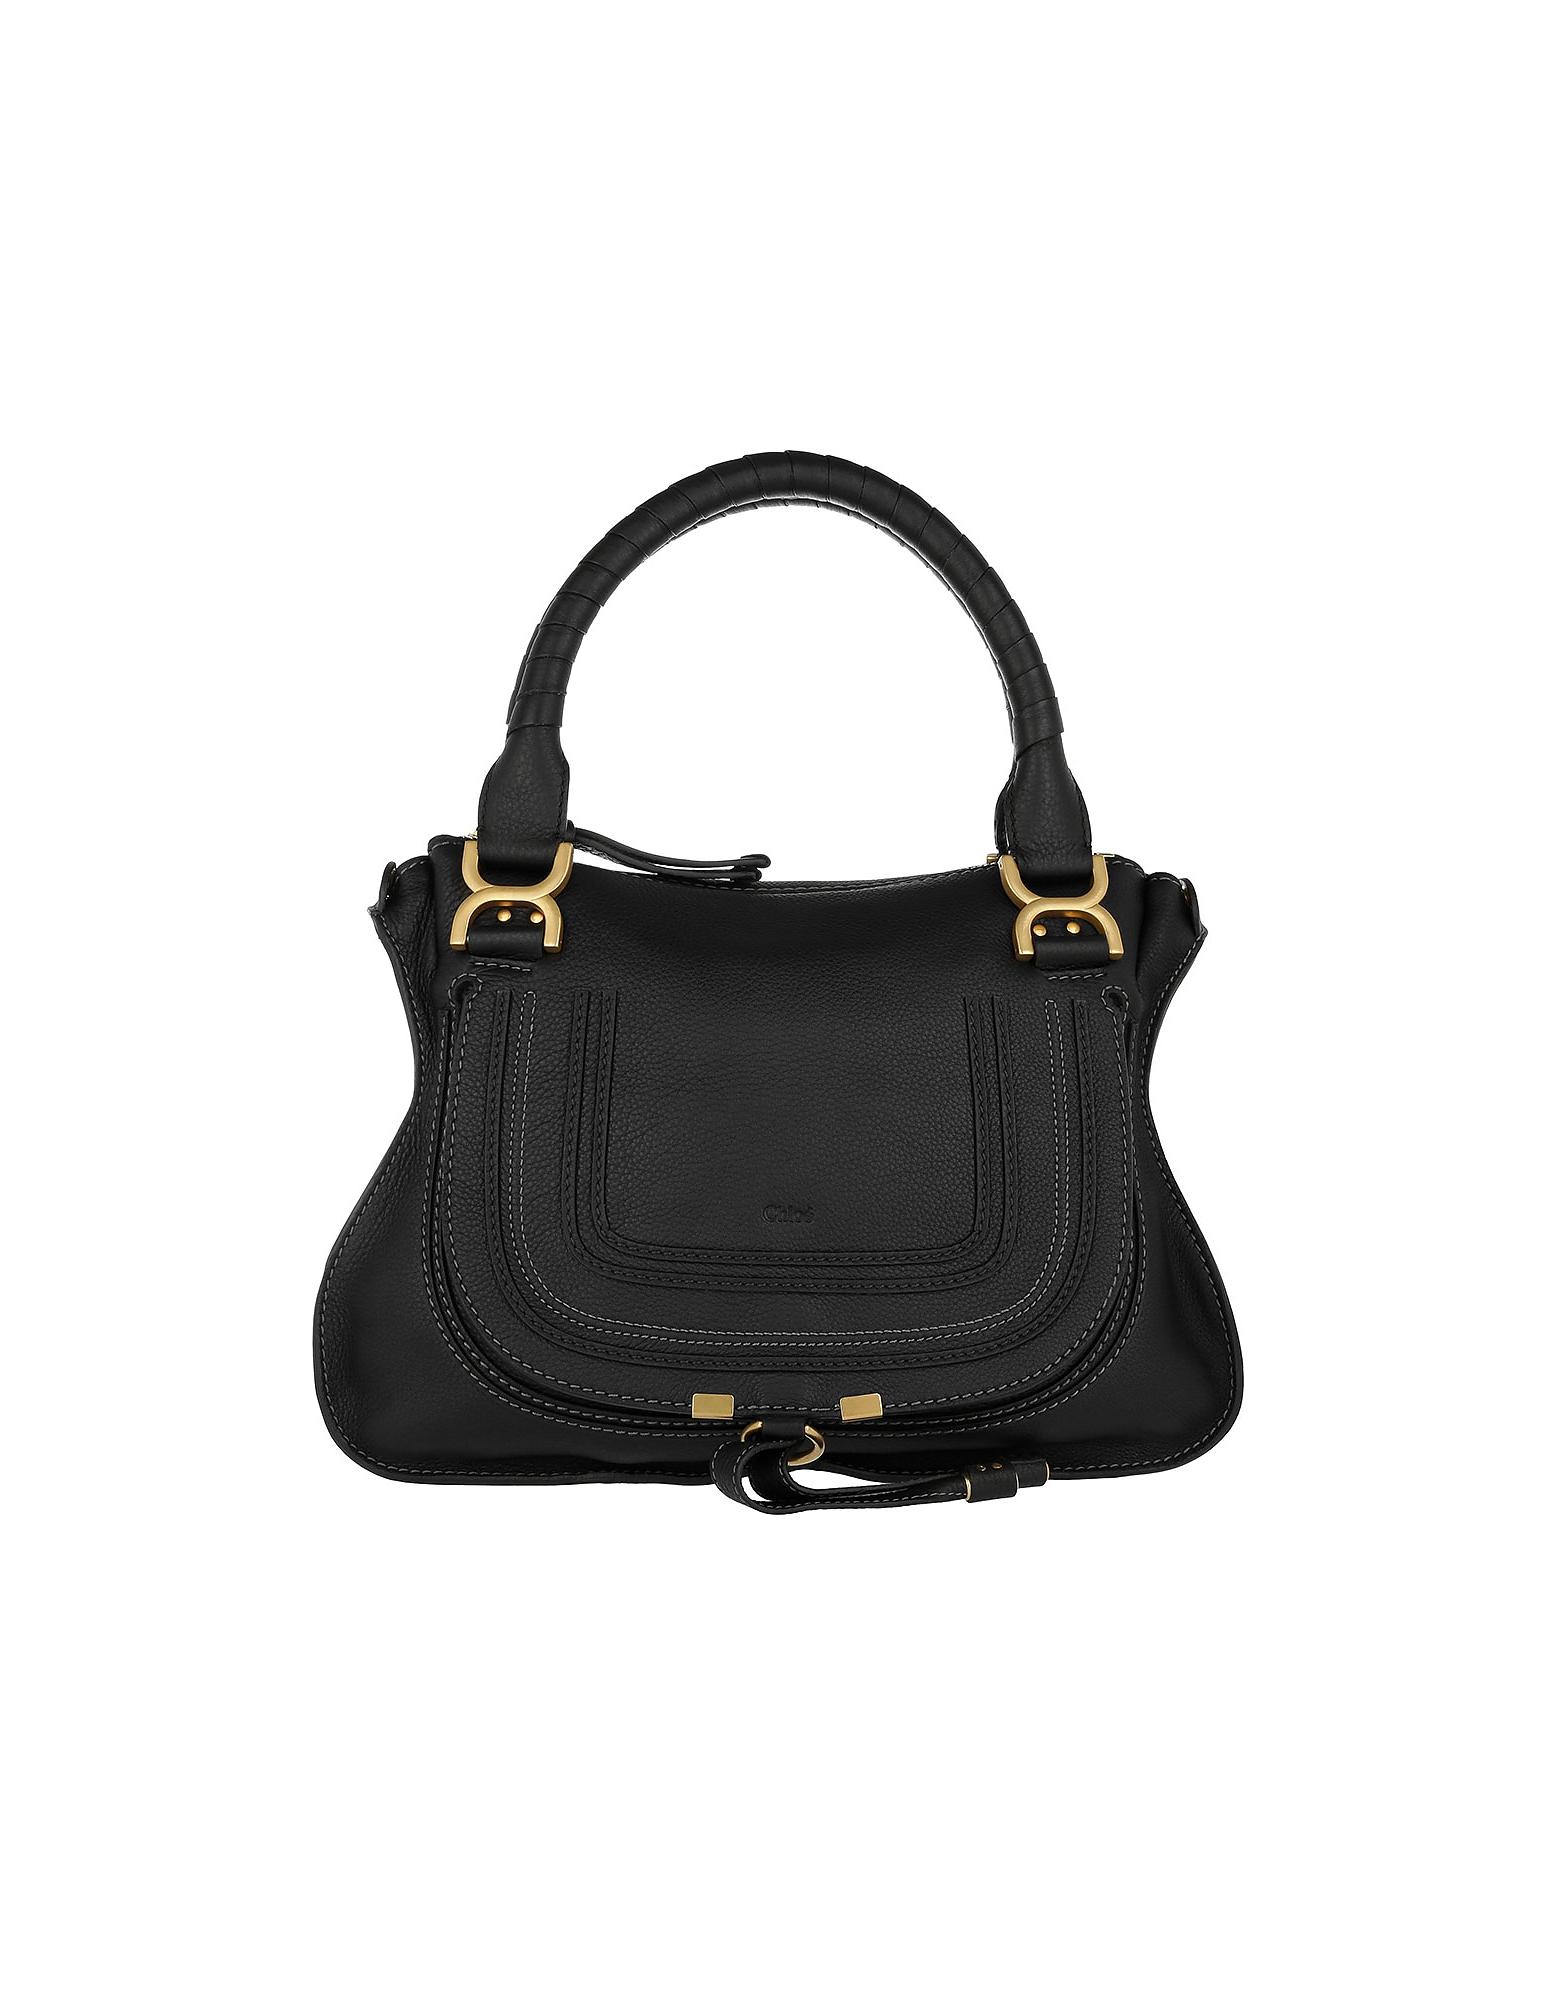 Chloe Handbags, Marcie Medium Shoulder Bag Black